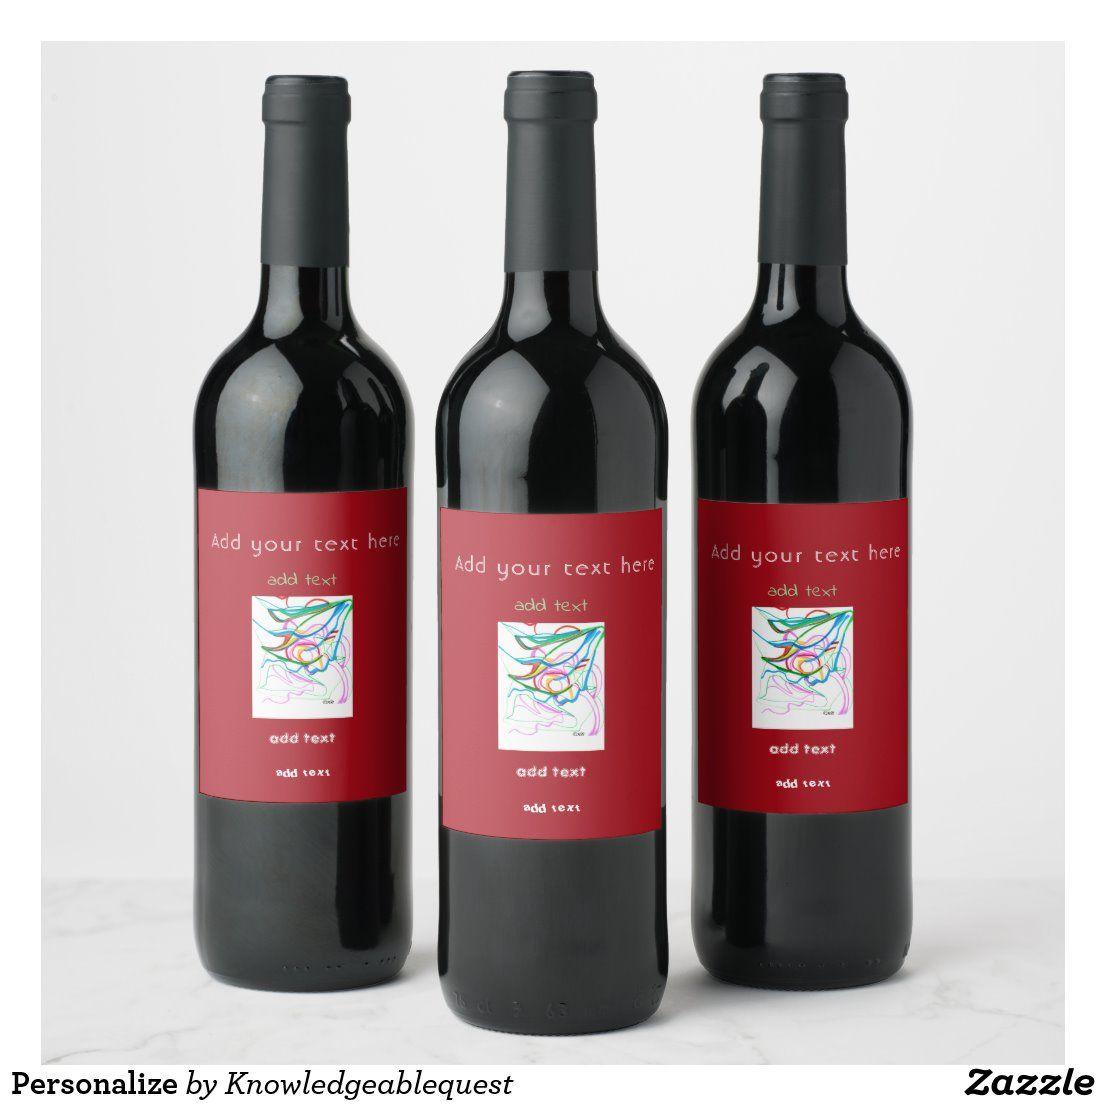 Personalize Wine Label Personalized Wine Labels Personalized Wine Champagne Bottle Labels